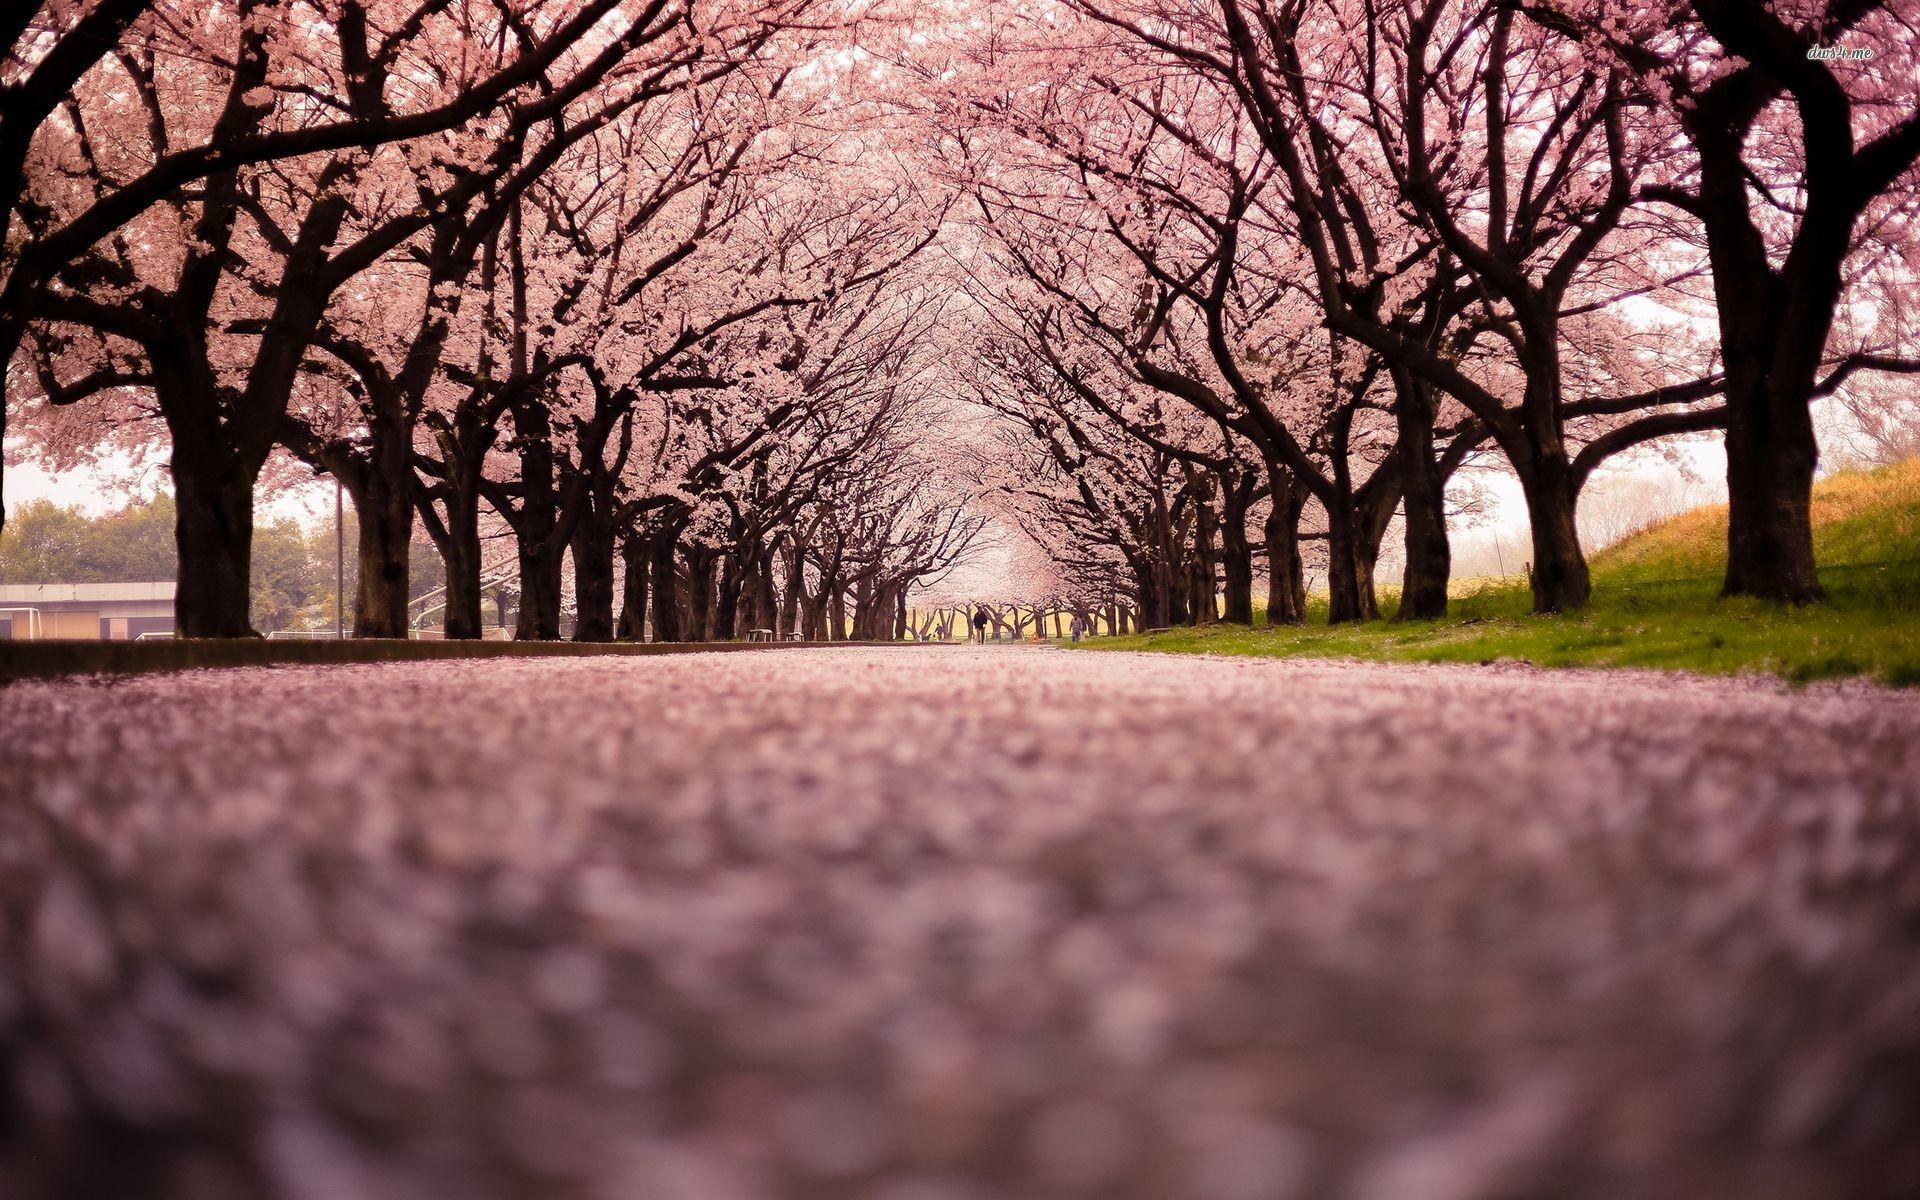 Row of cherry trees Nature HD desktop wallpaper, Tree wallpaper, Cherry  wallpaper, Blossom wallpaper – Nature no.